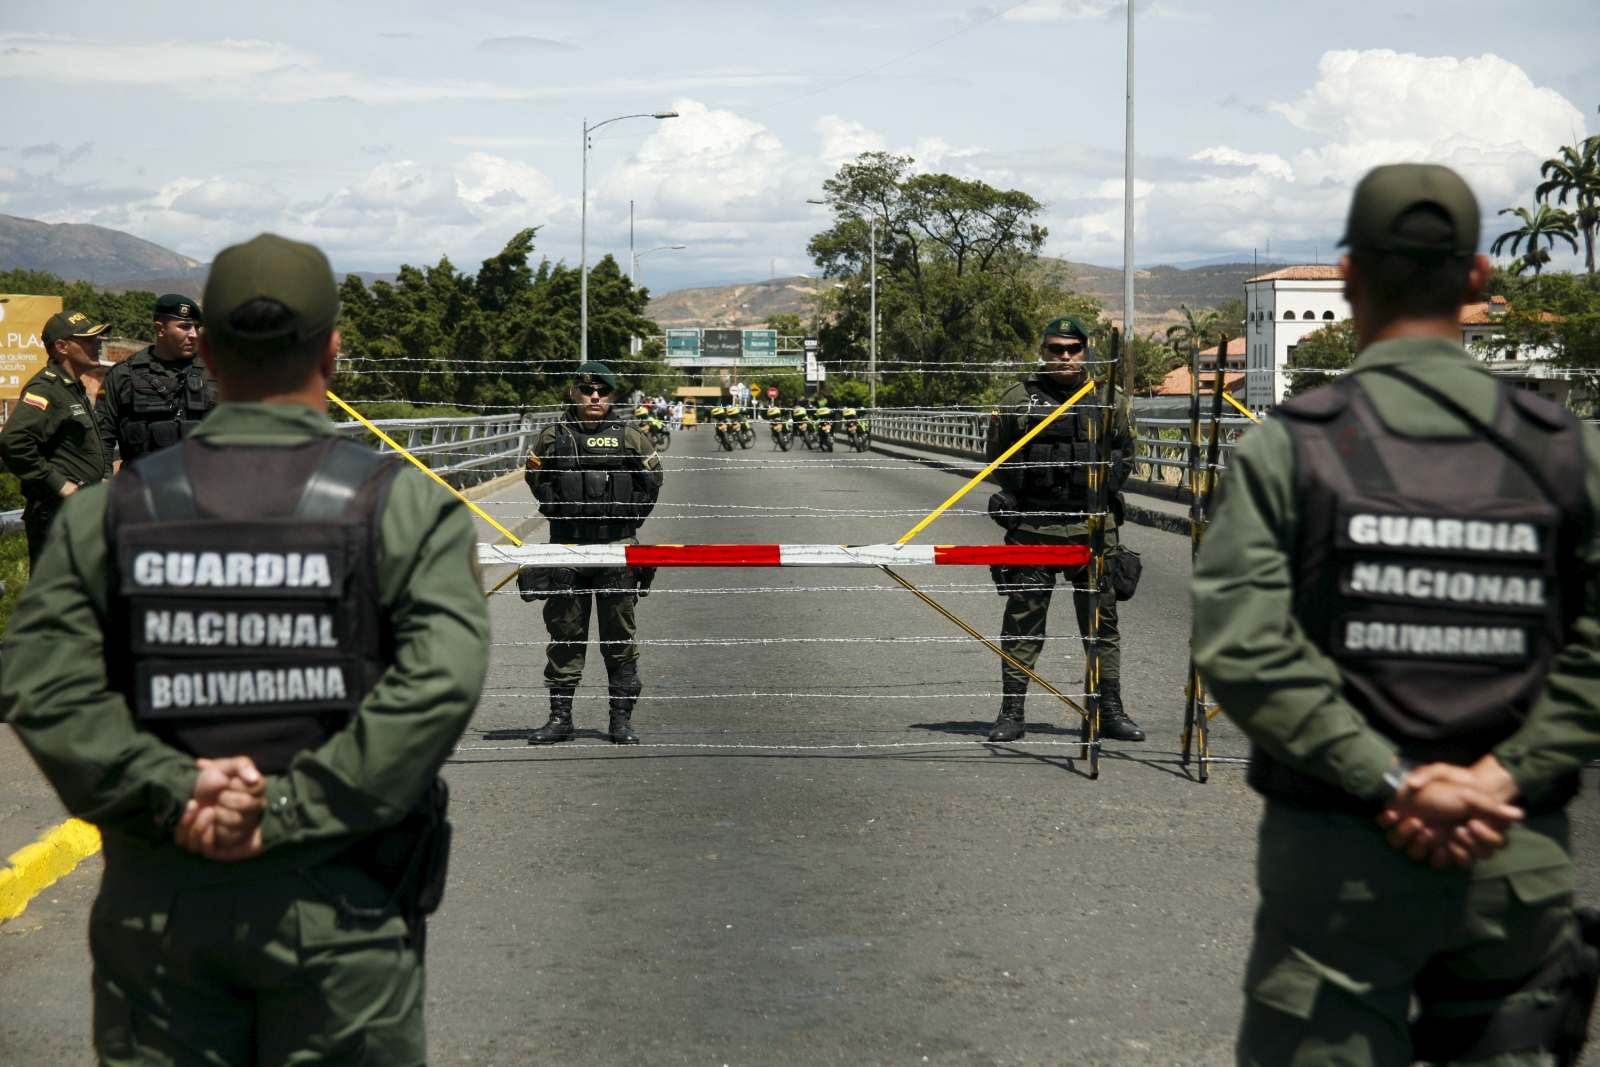 Venezuela border clashes